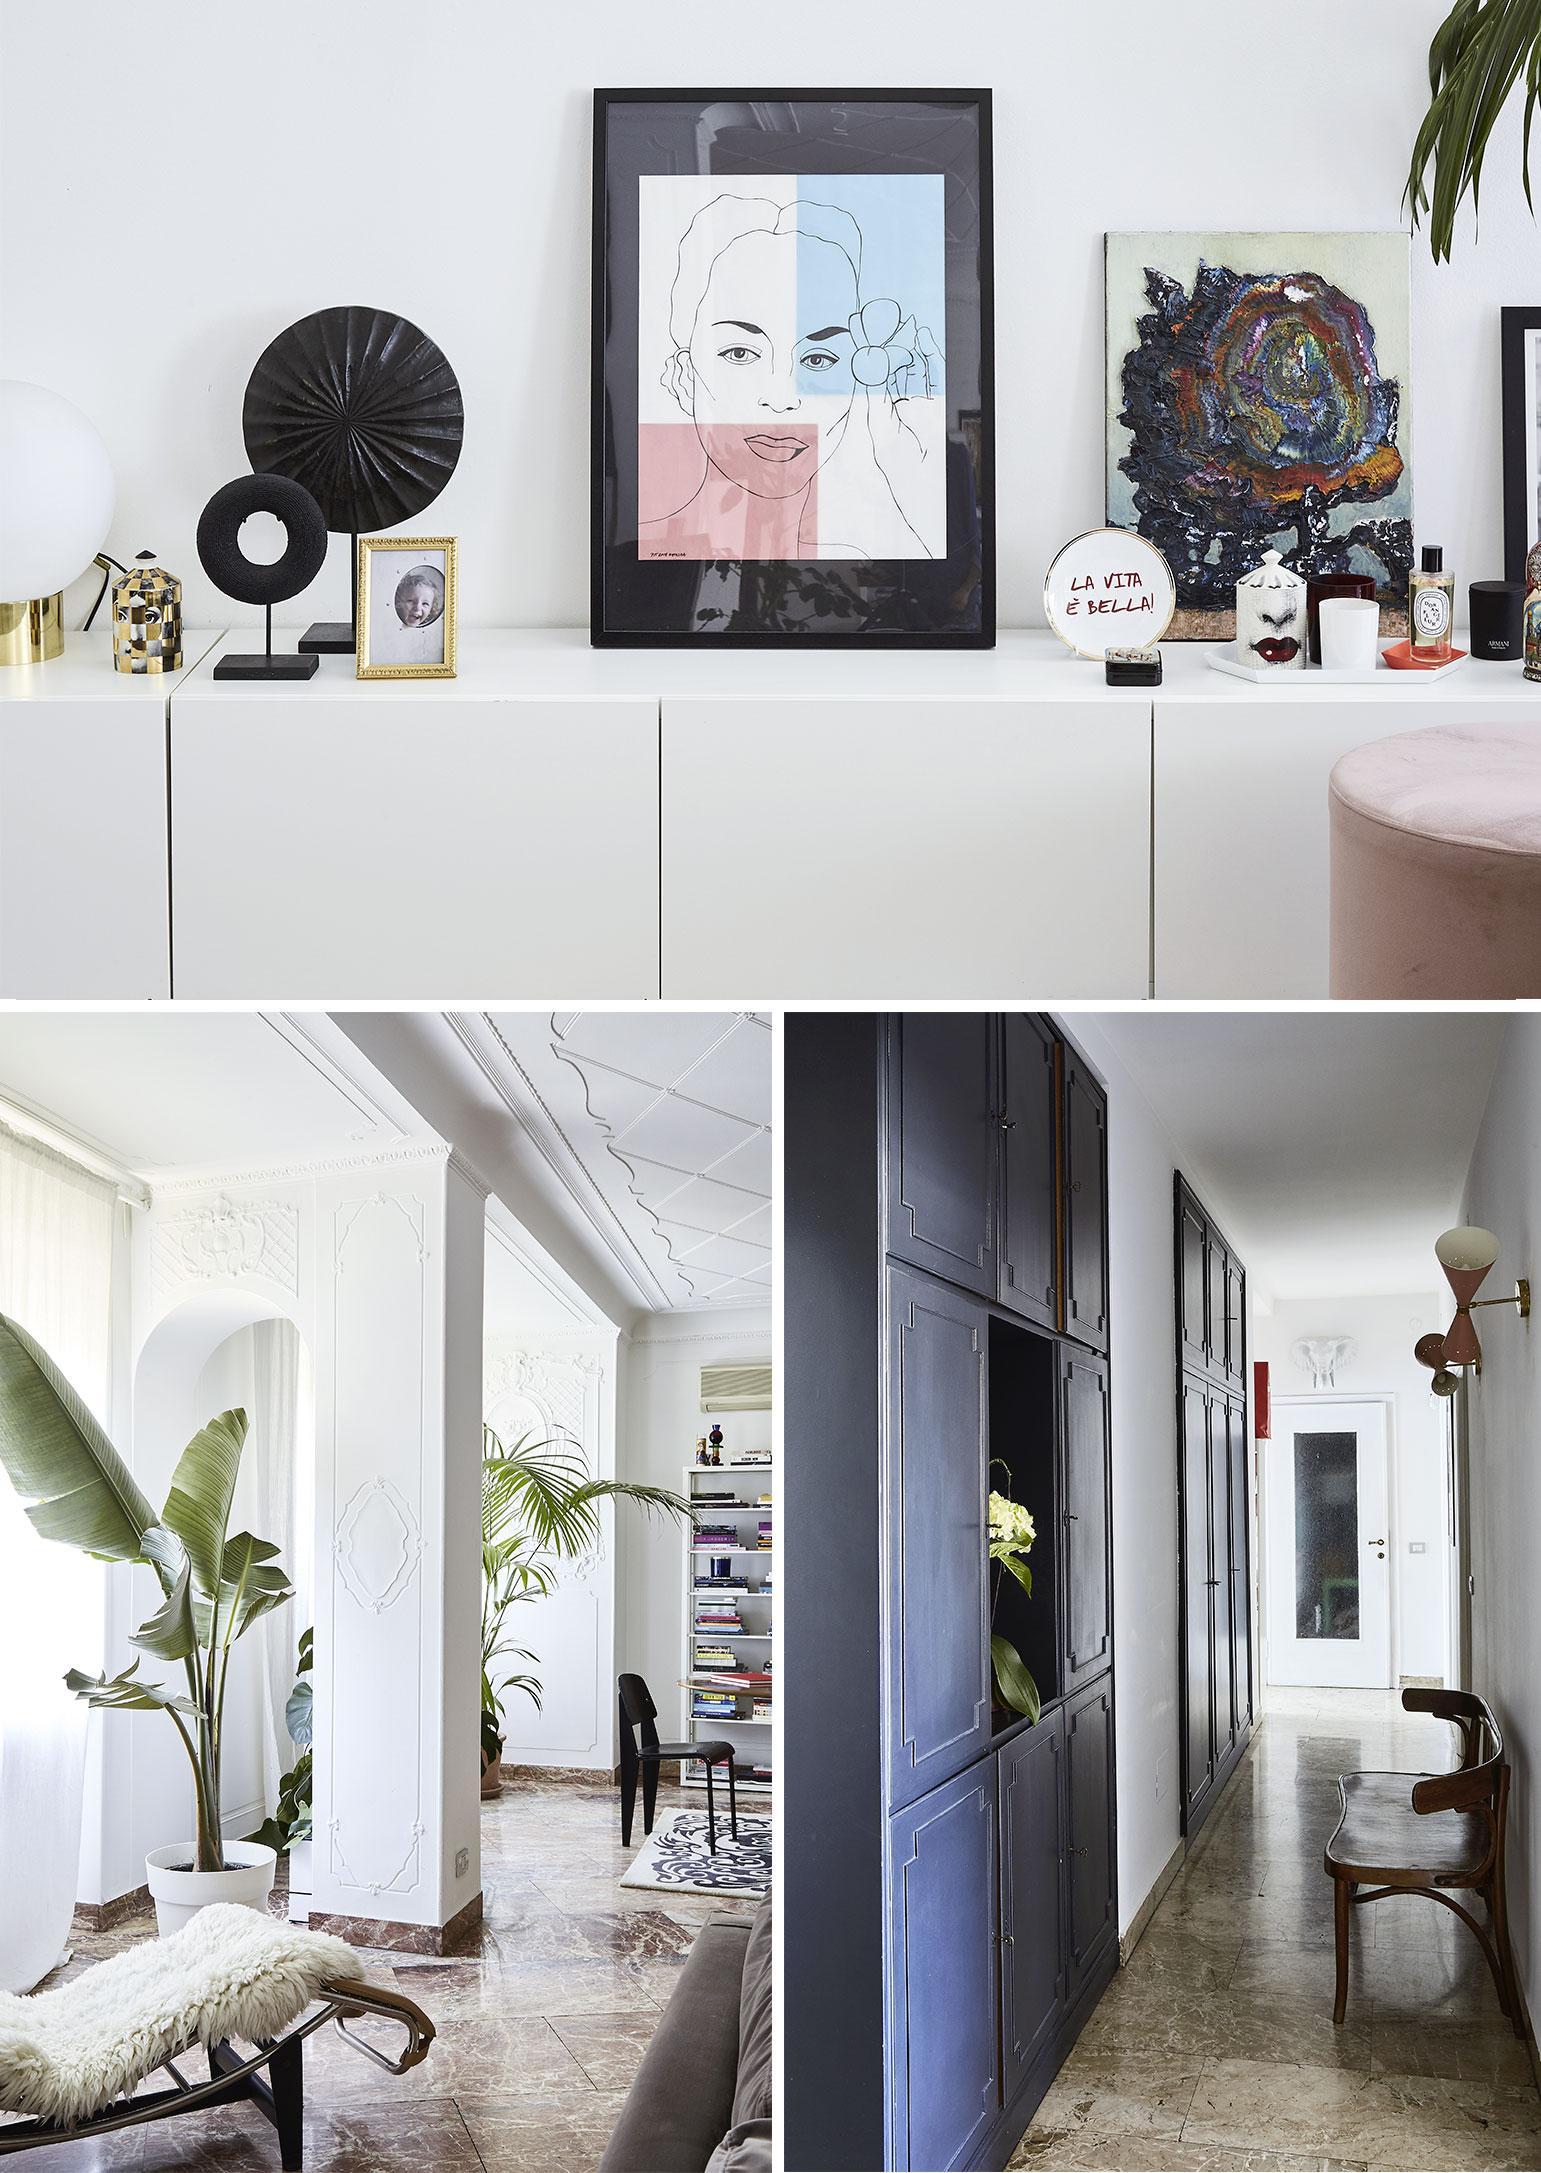 Natasha Slater, Dinner Conversation, Instagram, Dj, Casa, Stile, Milano, PR